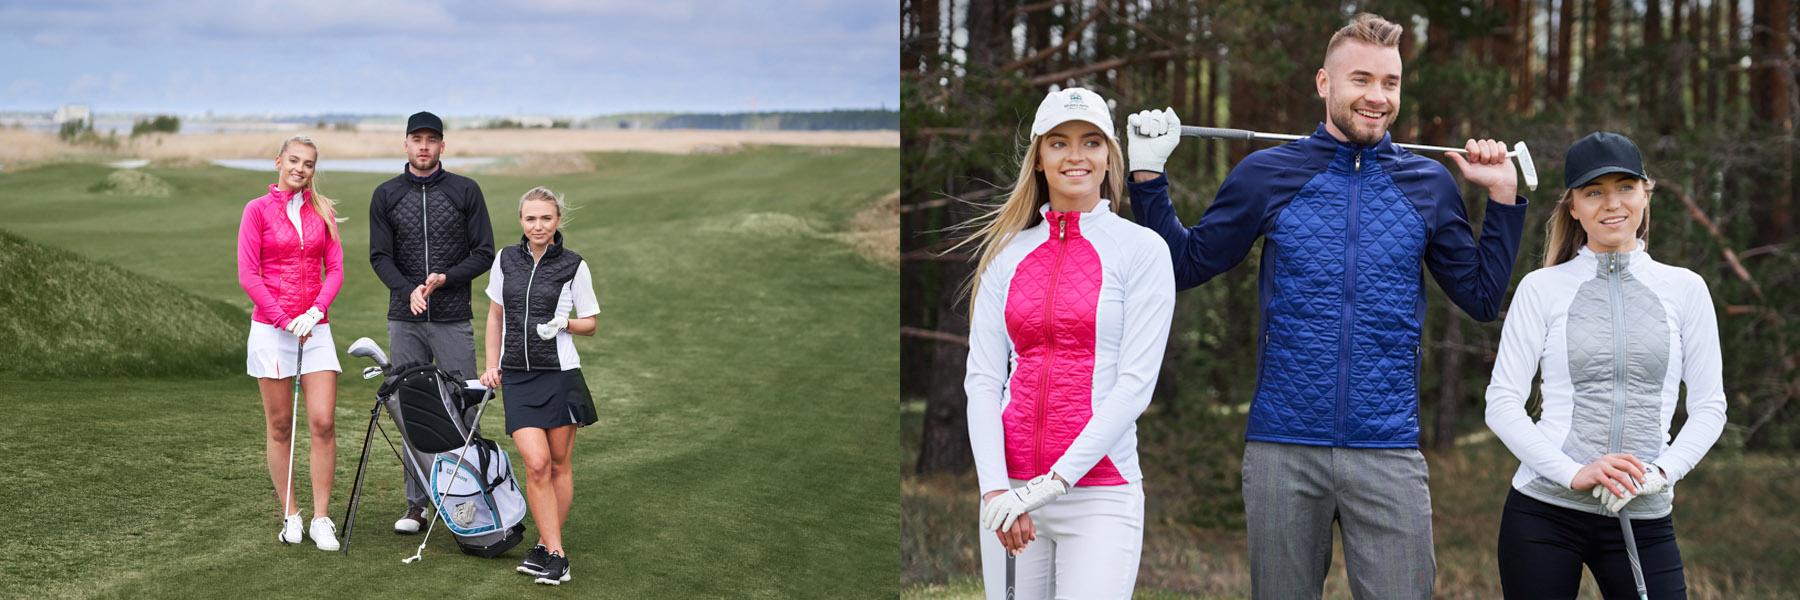 reklaamfotod fotograaf Kristian Kruuser sport golf fotograaf tallinnas-1.jpg